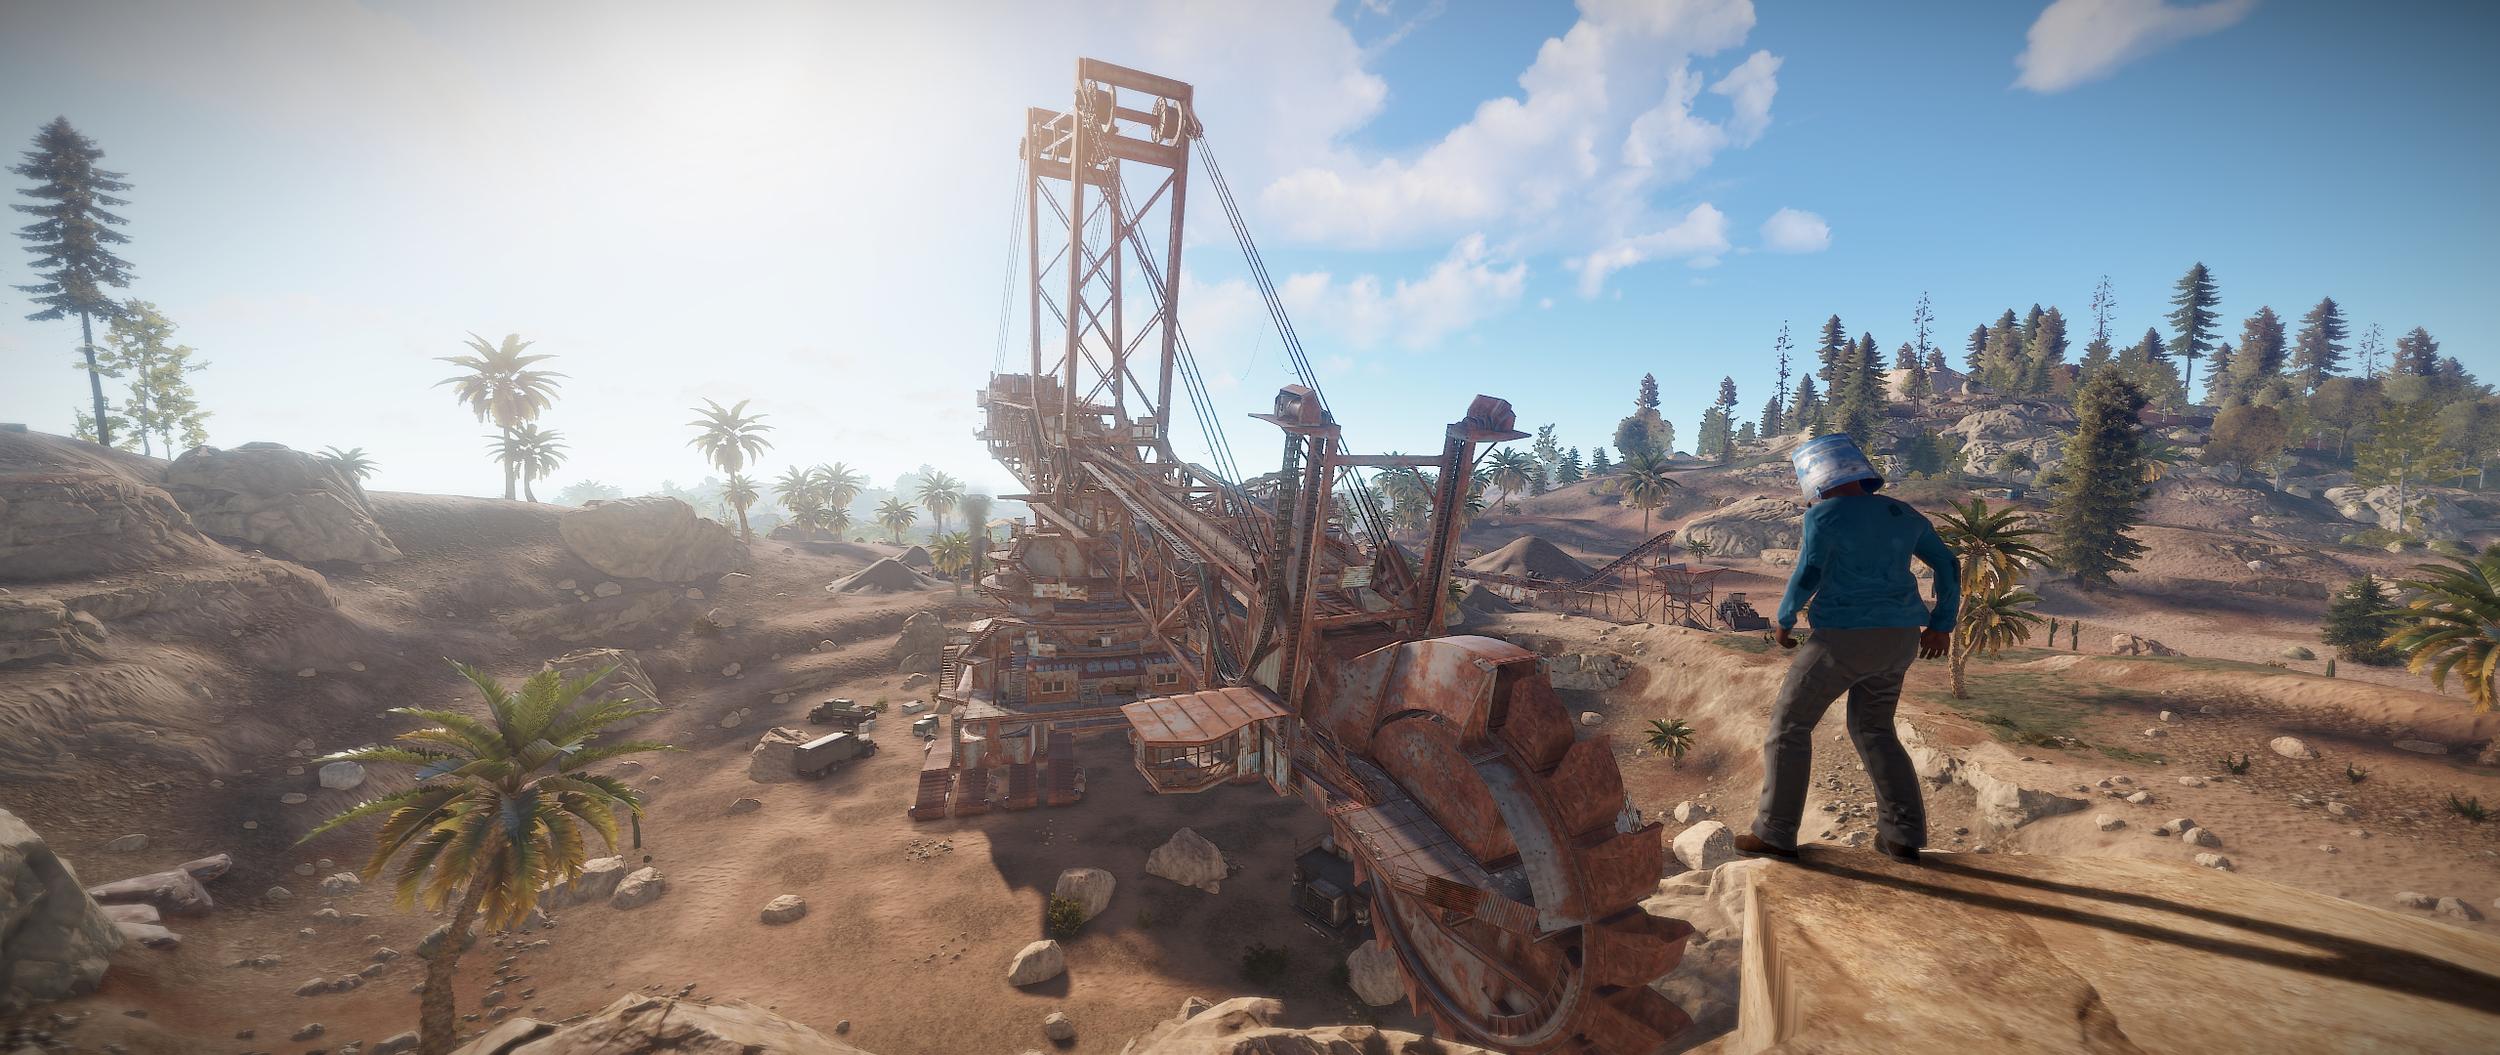 Giant Excavator Pit incoming! — Rustafied